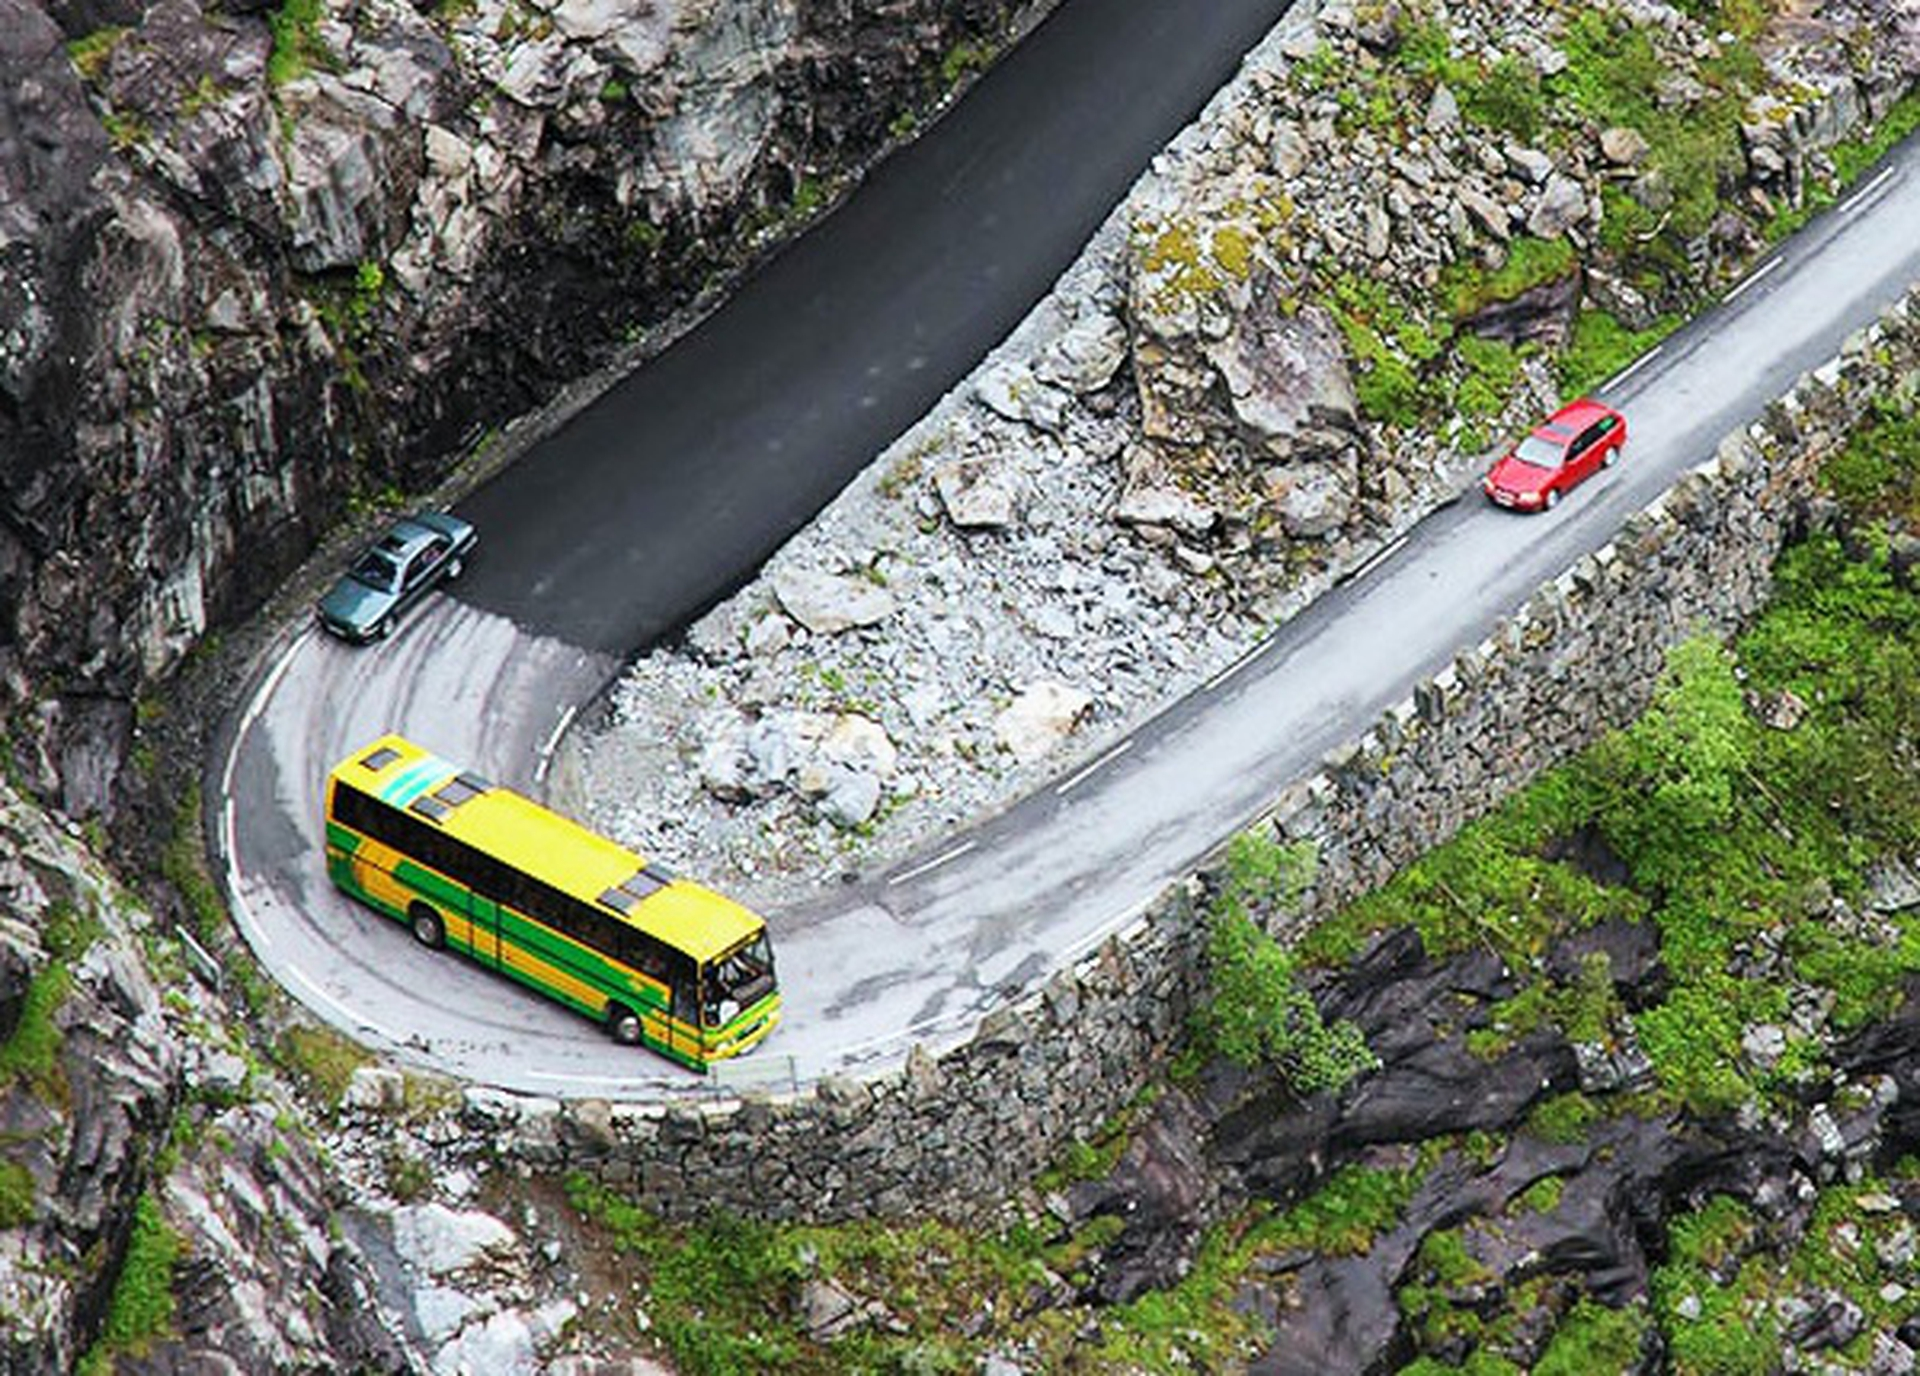 Evaluating Road Hazards - Defensive Driving